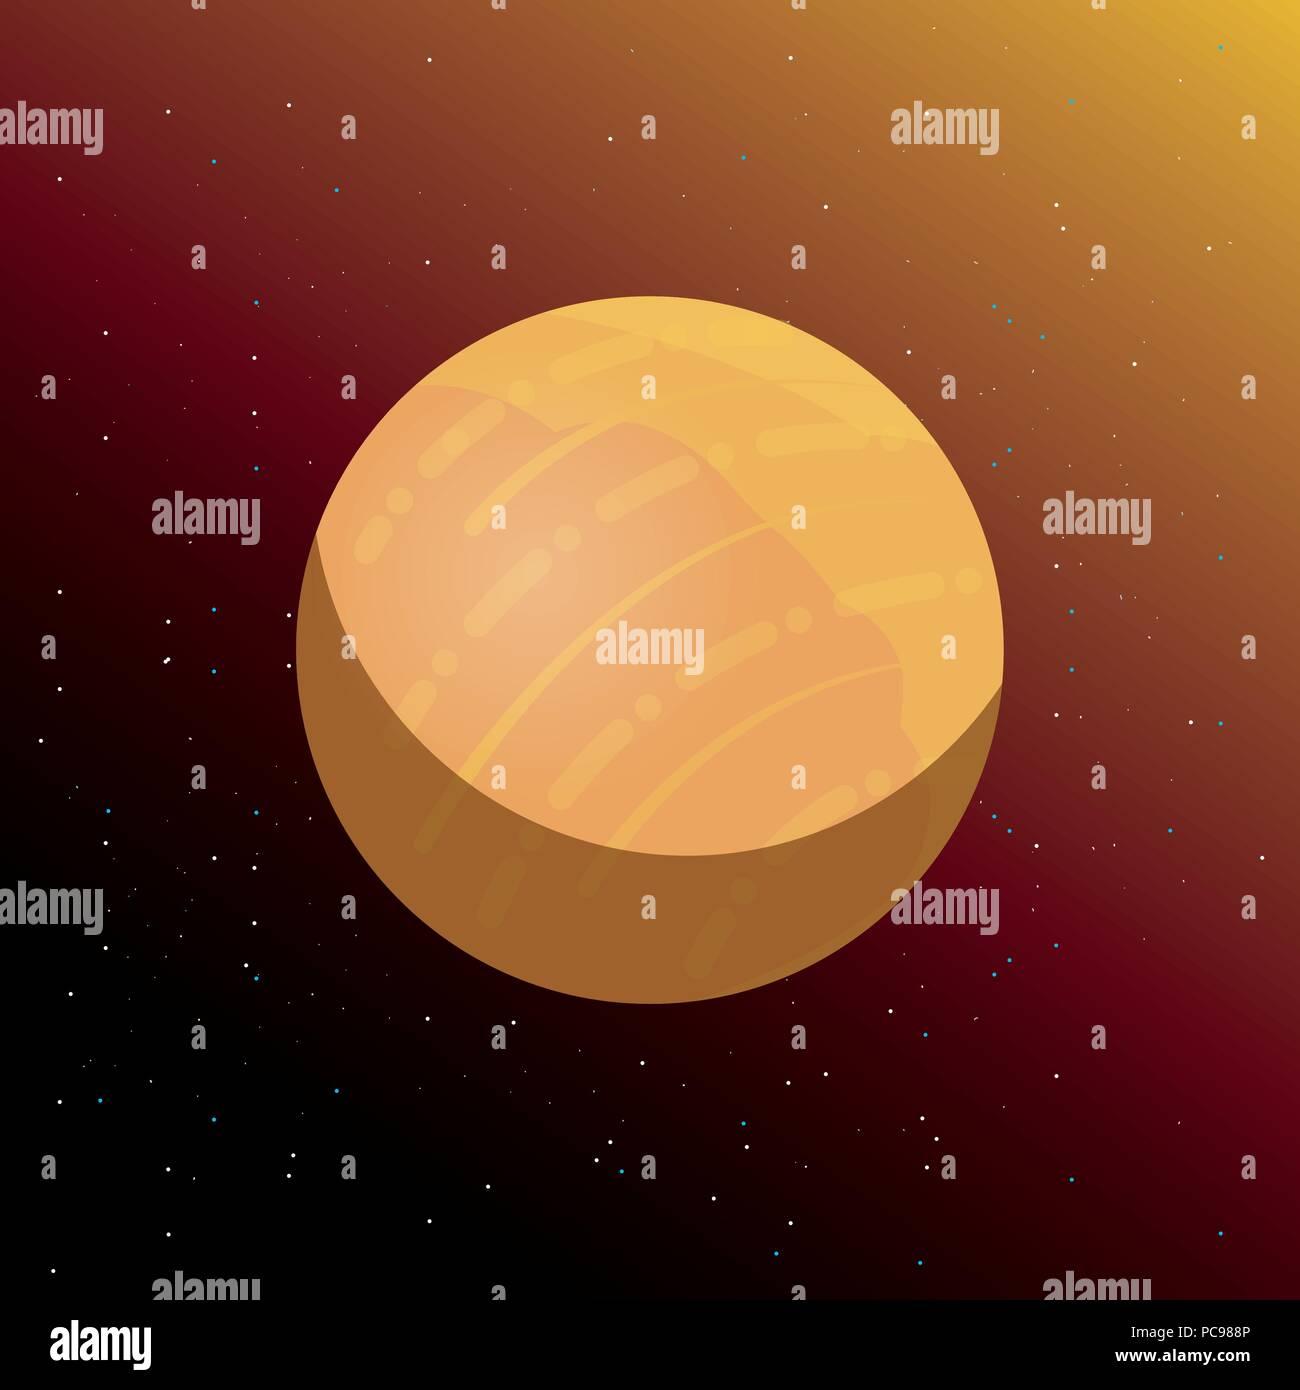 venus planet over space background, colorful design. vector illustration - Stock Image